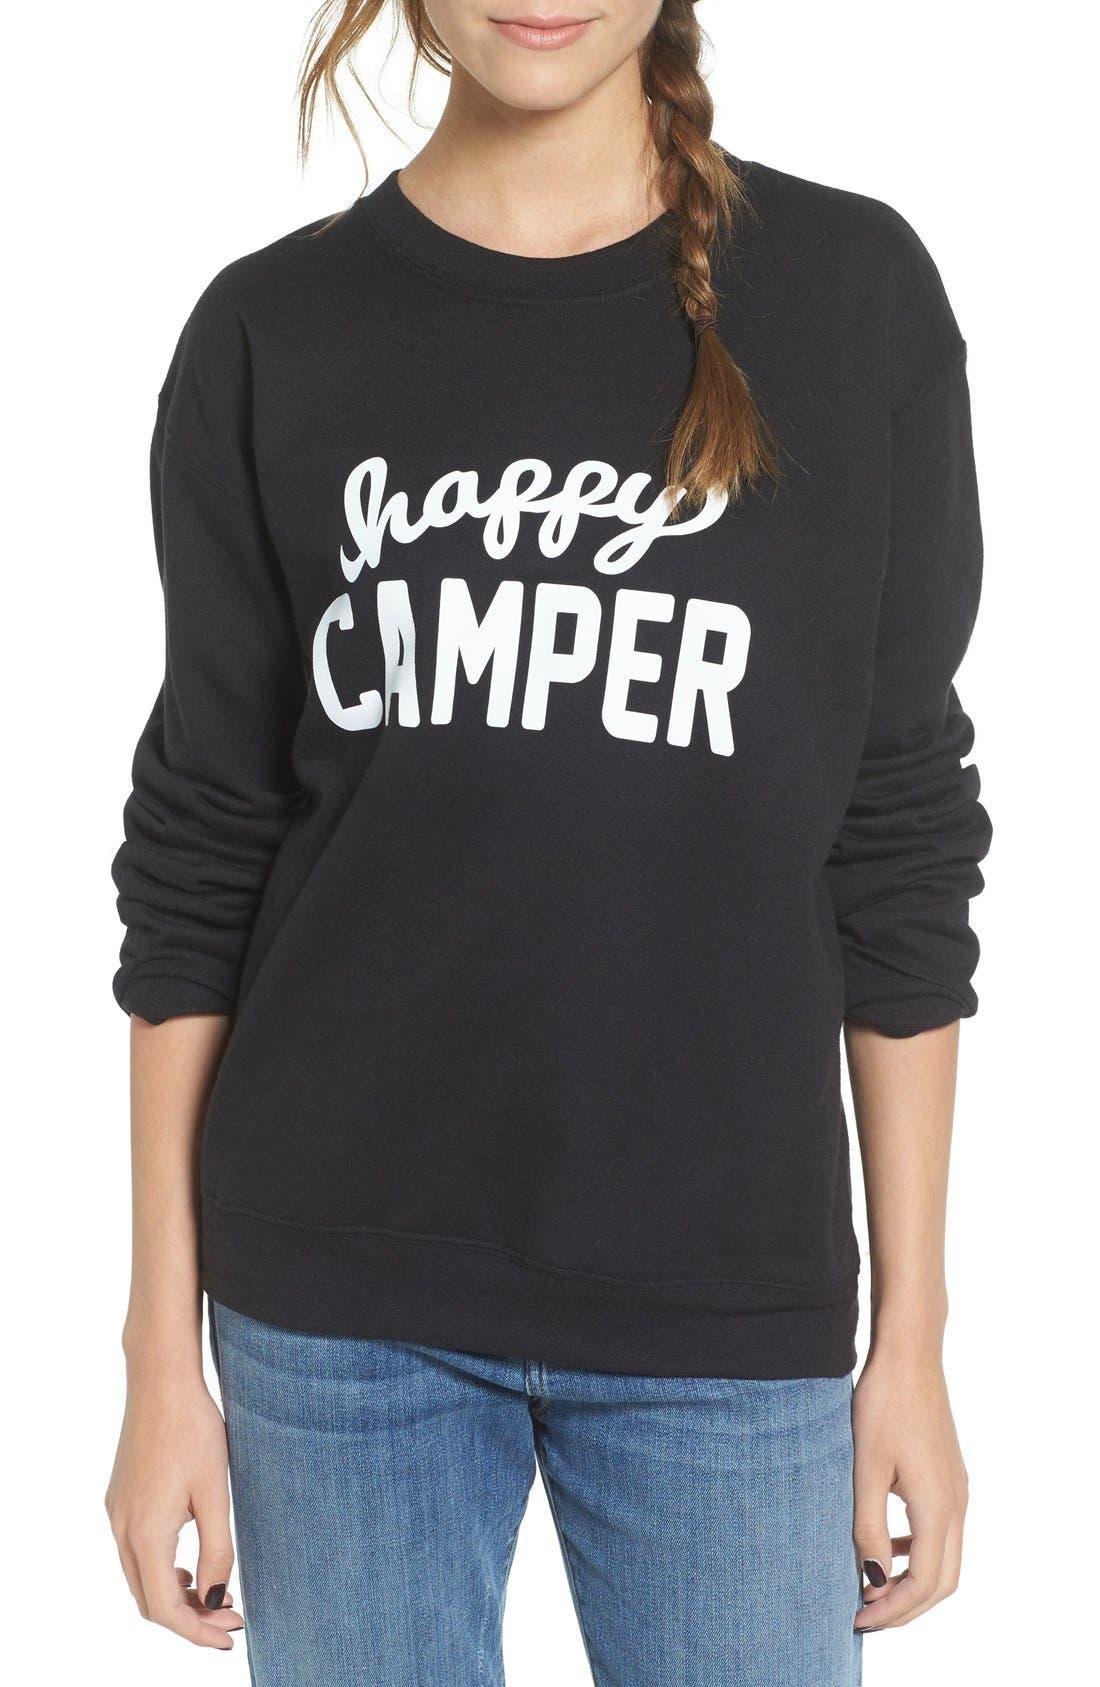 Alternate Image 1 Selected - Sub_Urban Riot 'Happy Camper' Graphic Sweatshirt